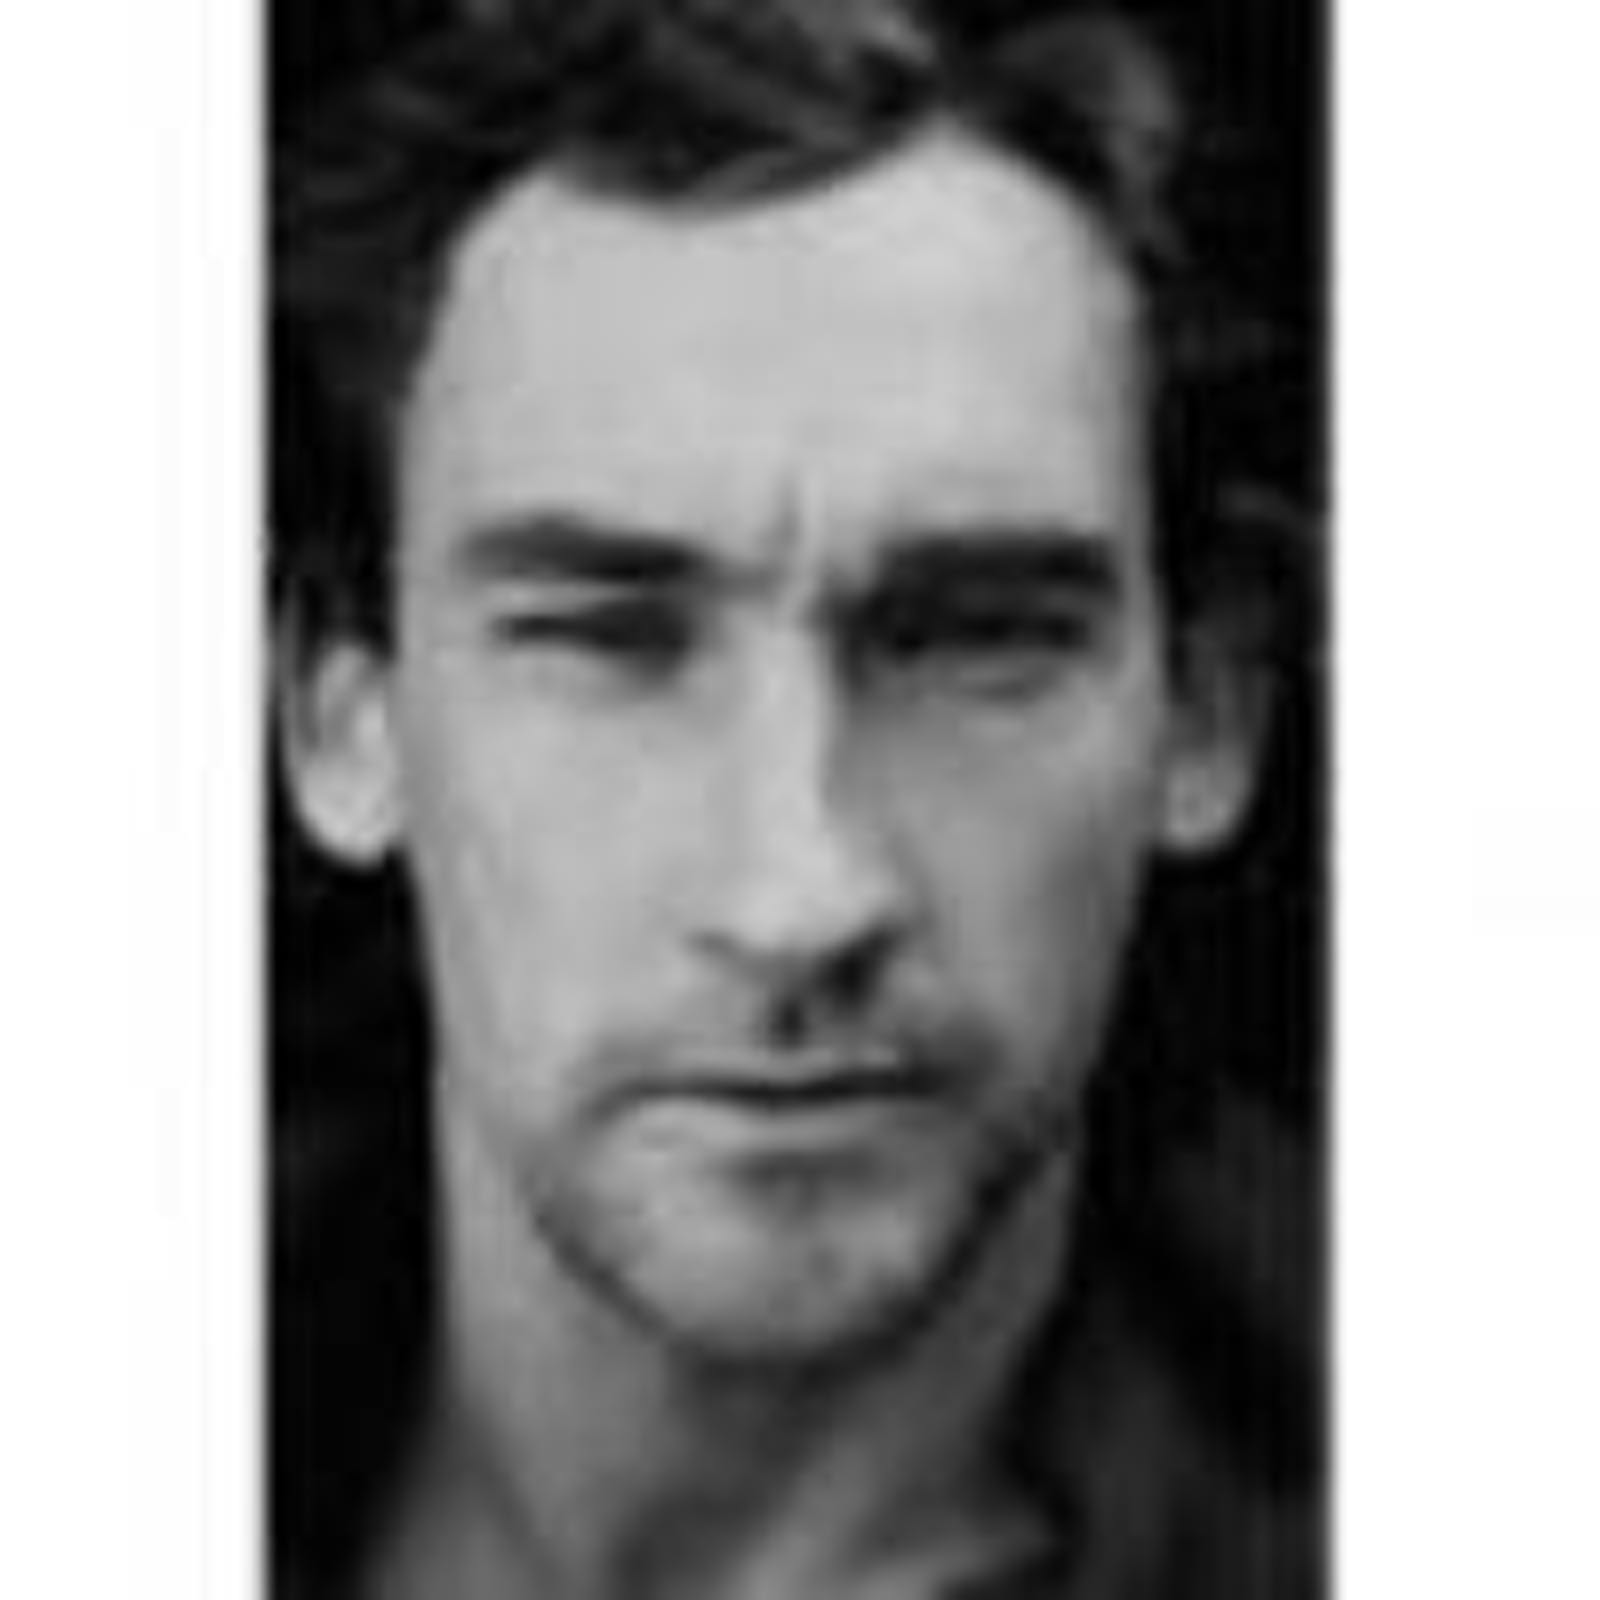 Joseph Mawle